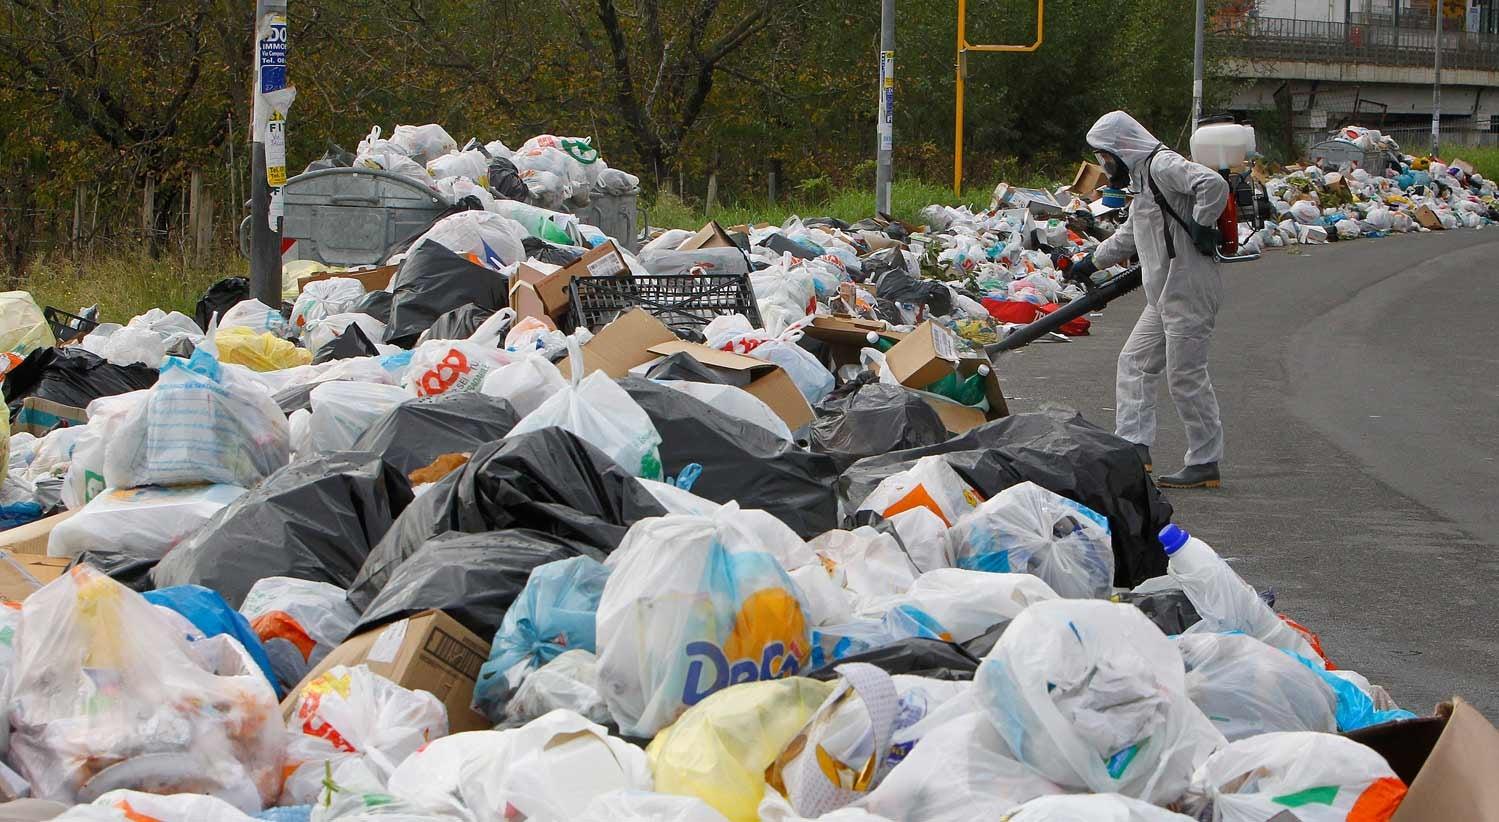 País - Lixo suspeito vindo de Itália chega a Portugal